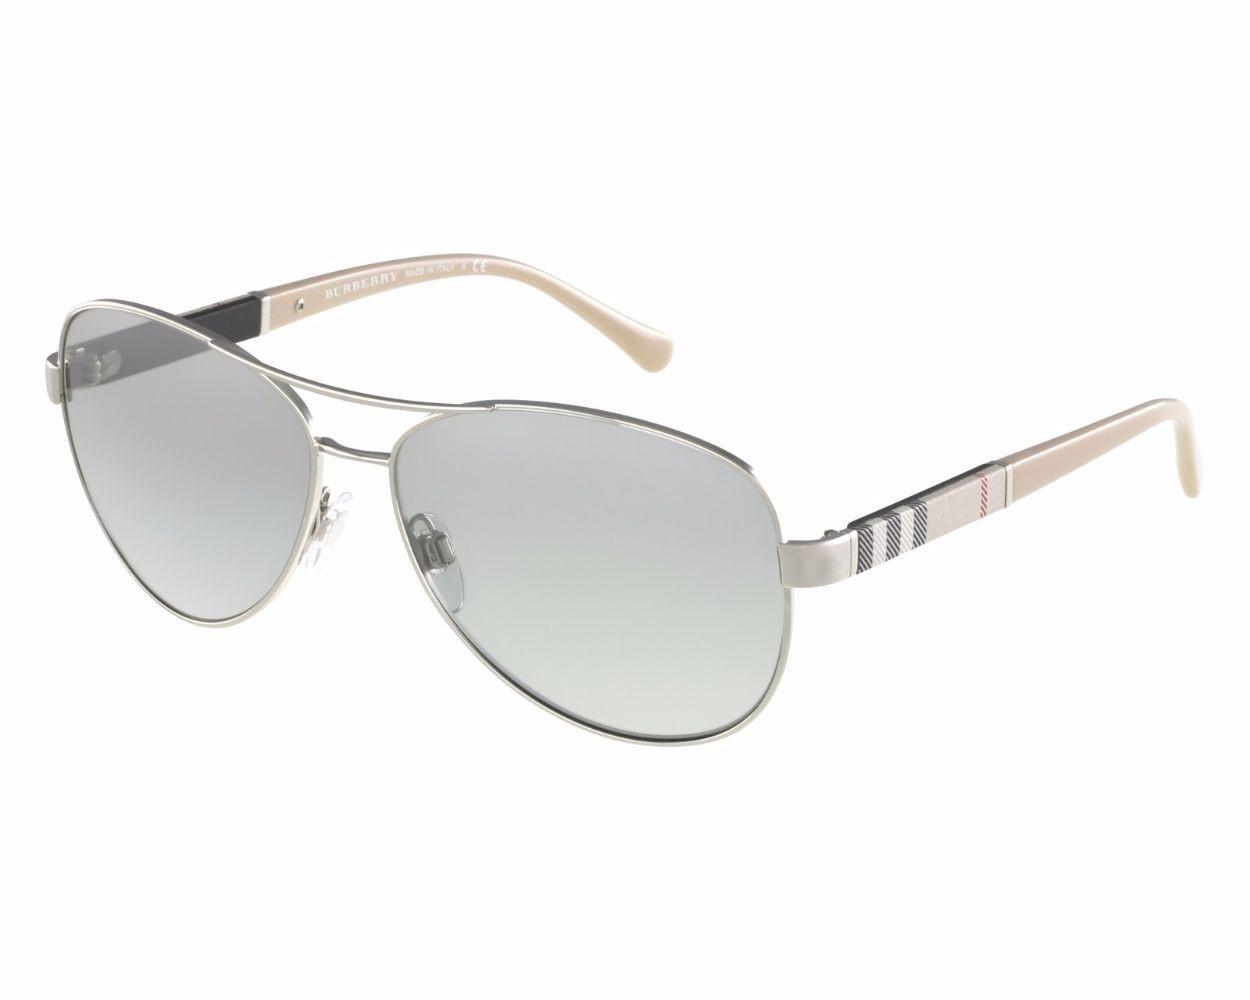 49d9a65db6 Lyst - Burberry Be3080 10056v 59mm Sunglasses